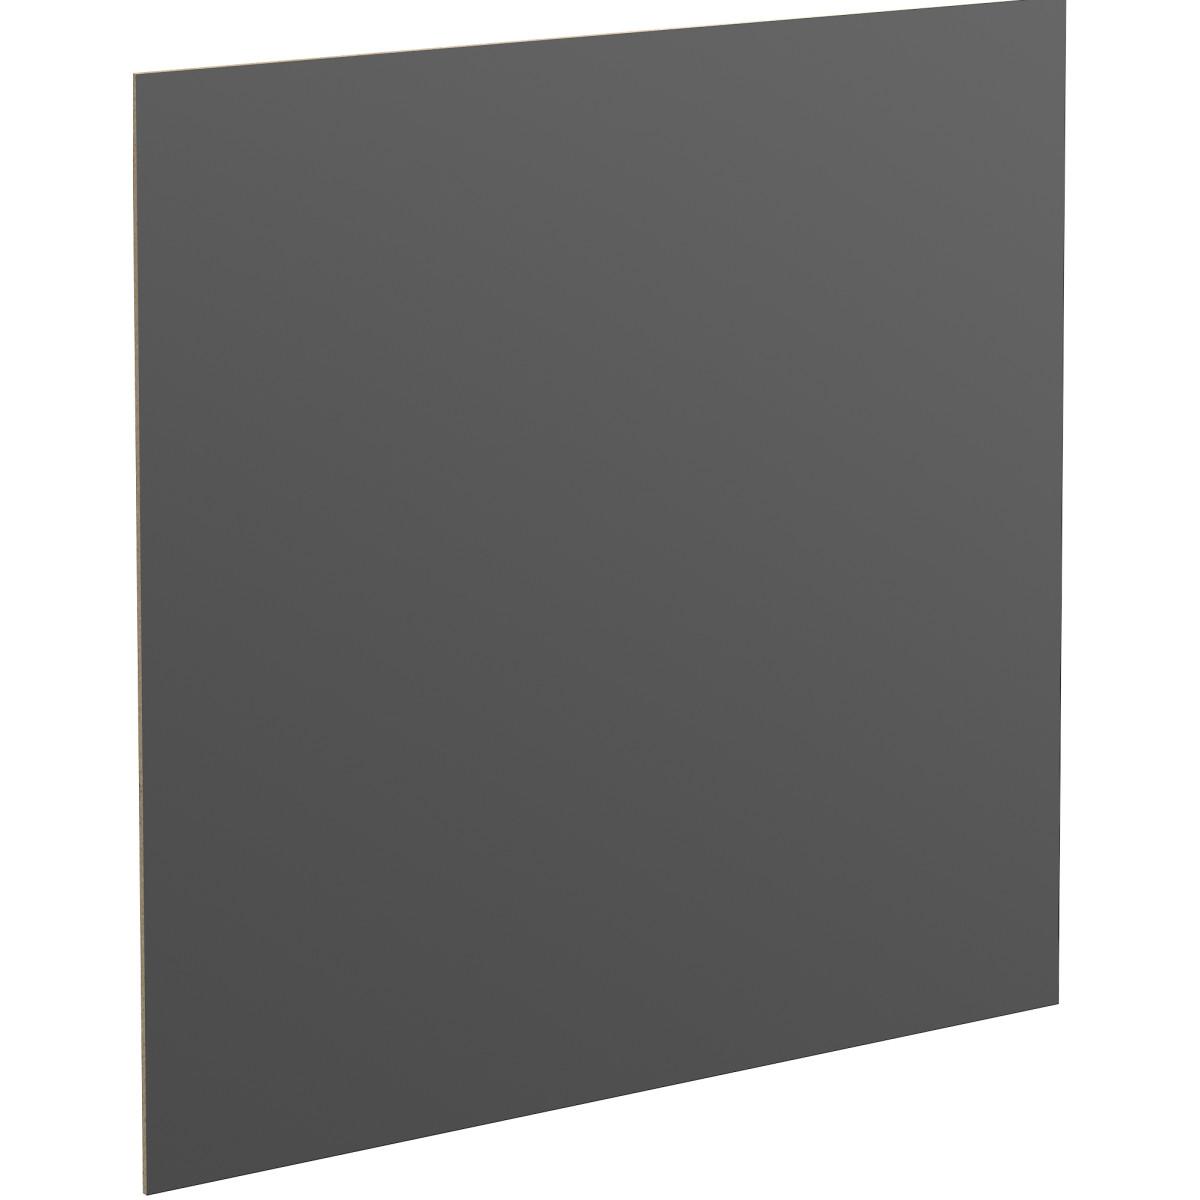 Задняя стенка SPACEO KUB 44х35.8 см МДФ цвет черный